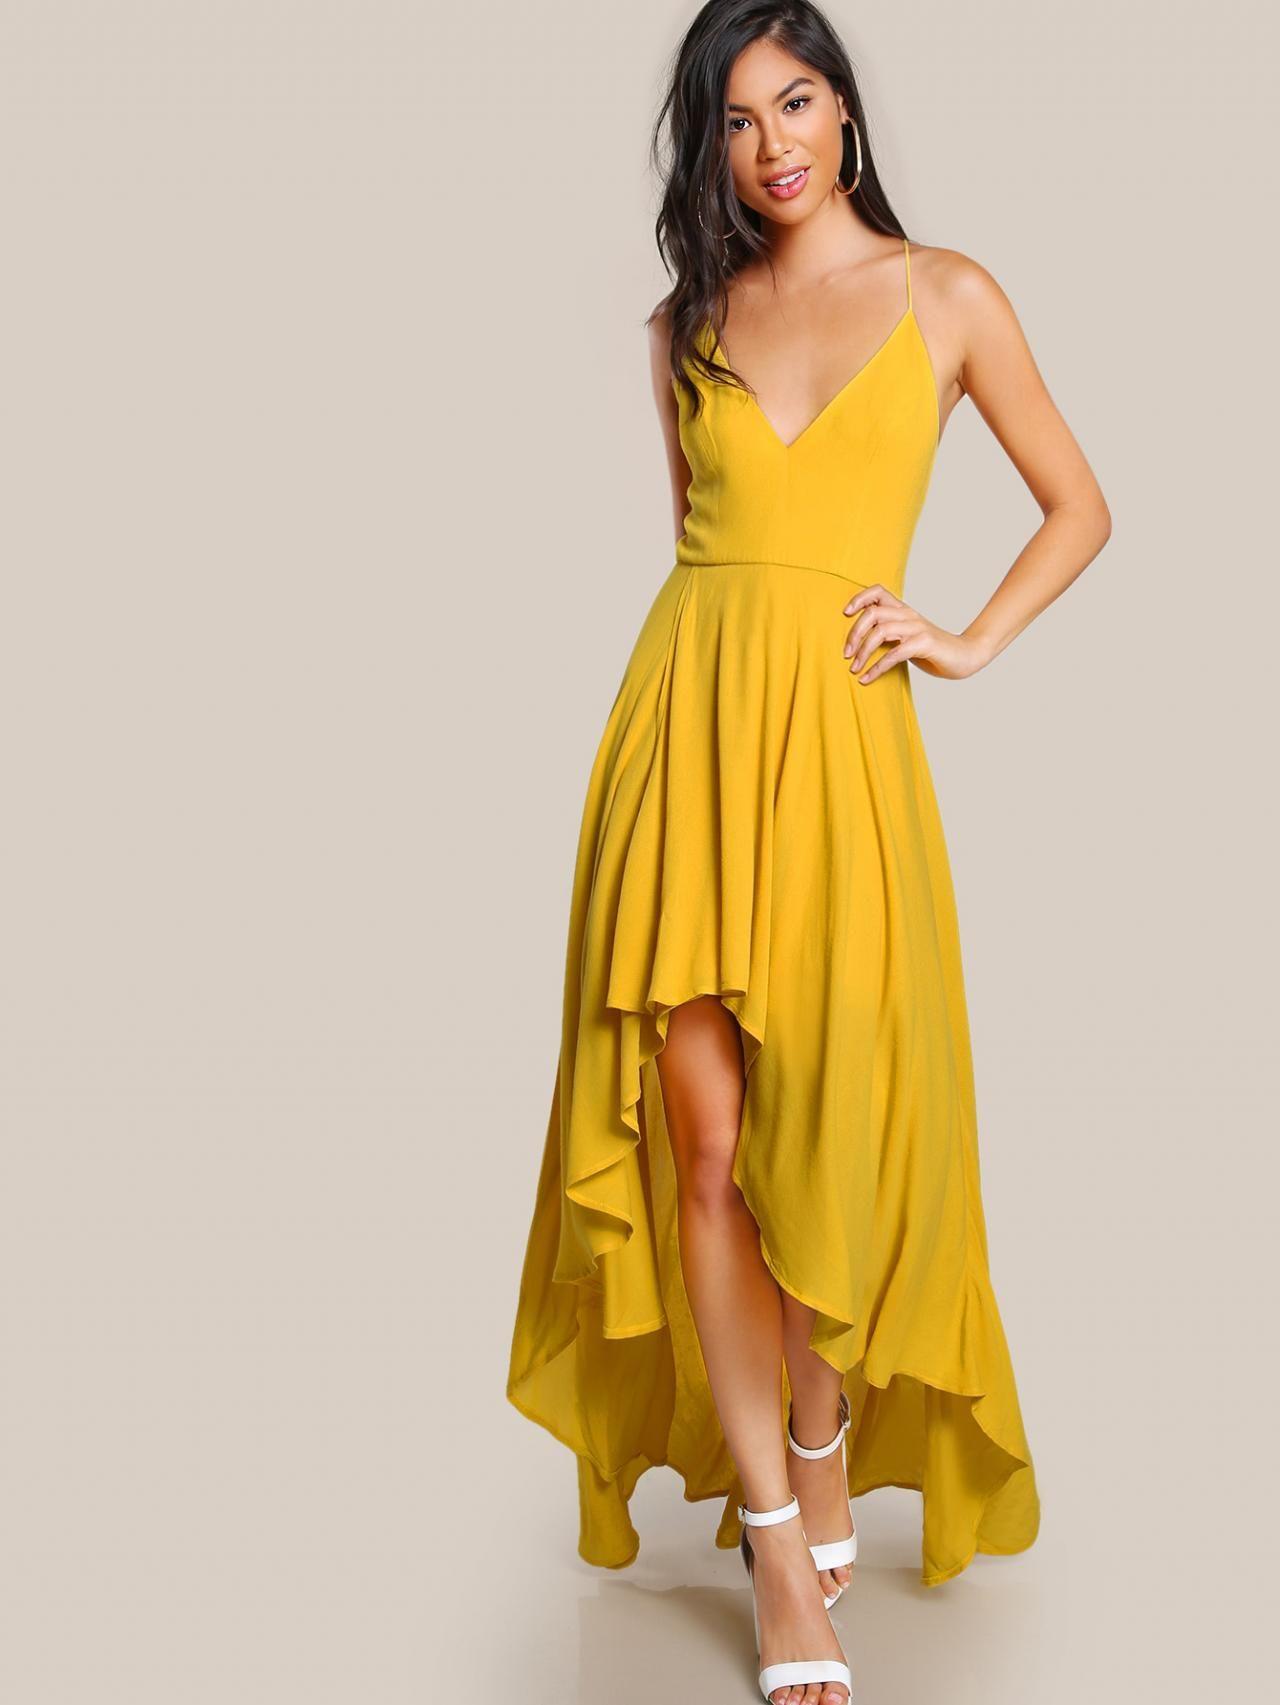 16d09f5568a Backless High Low Cami Dress Yellow Long Chiffon Prom Dress,Floor ...